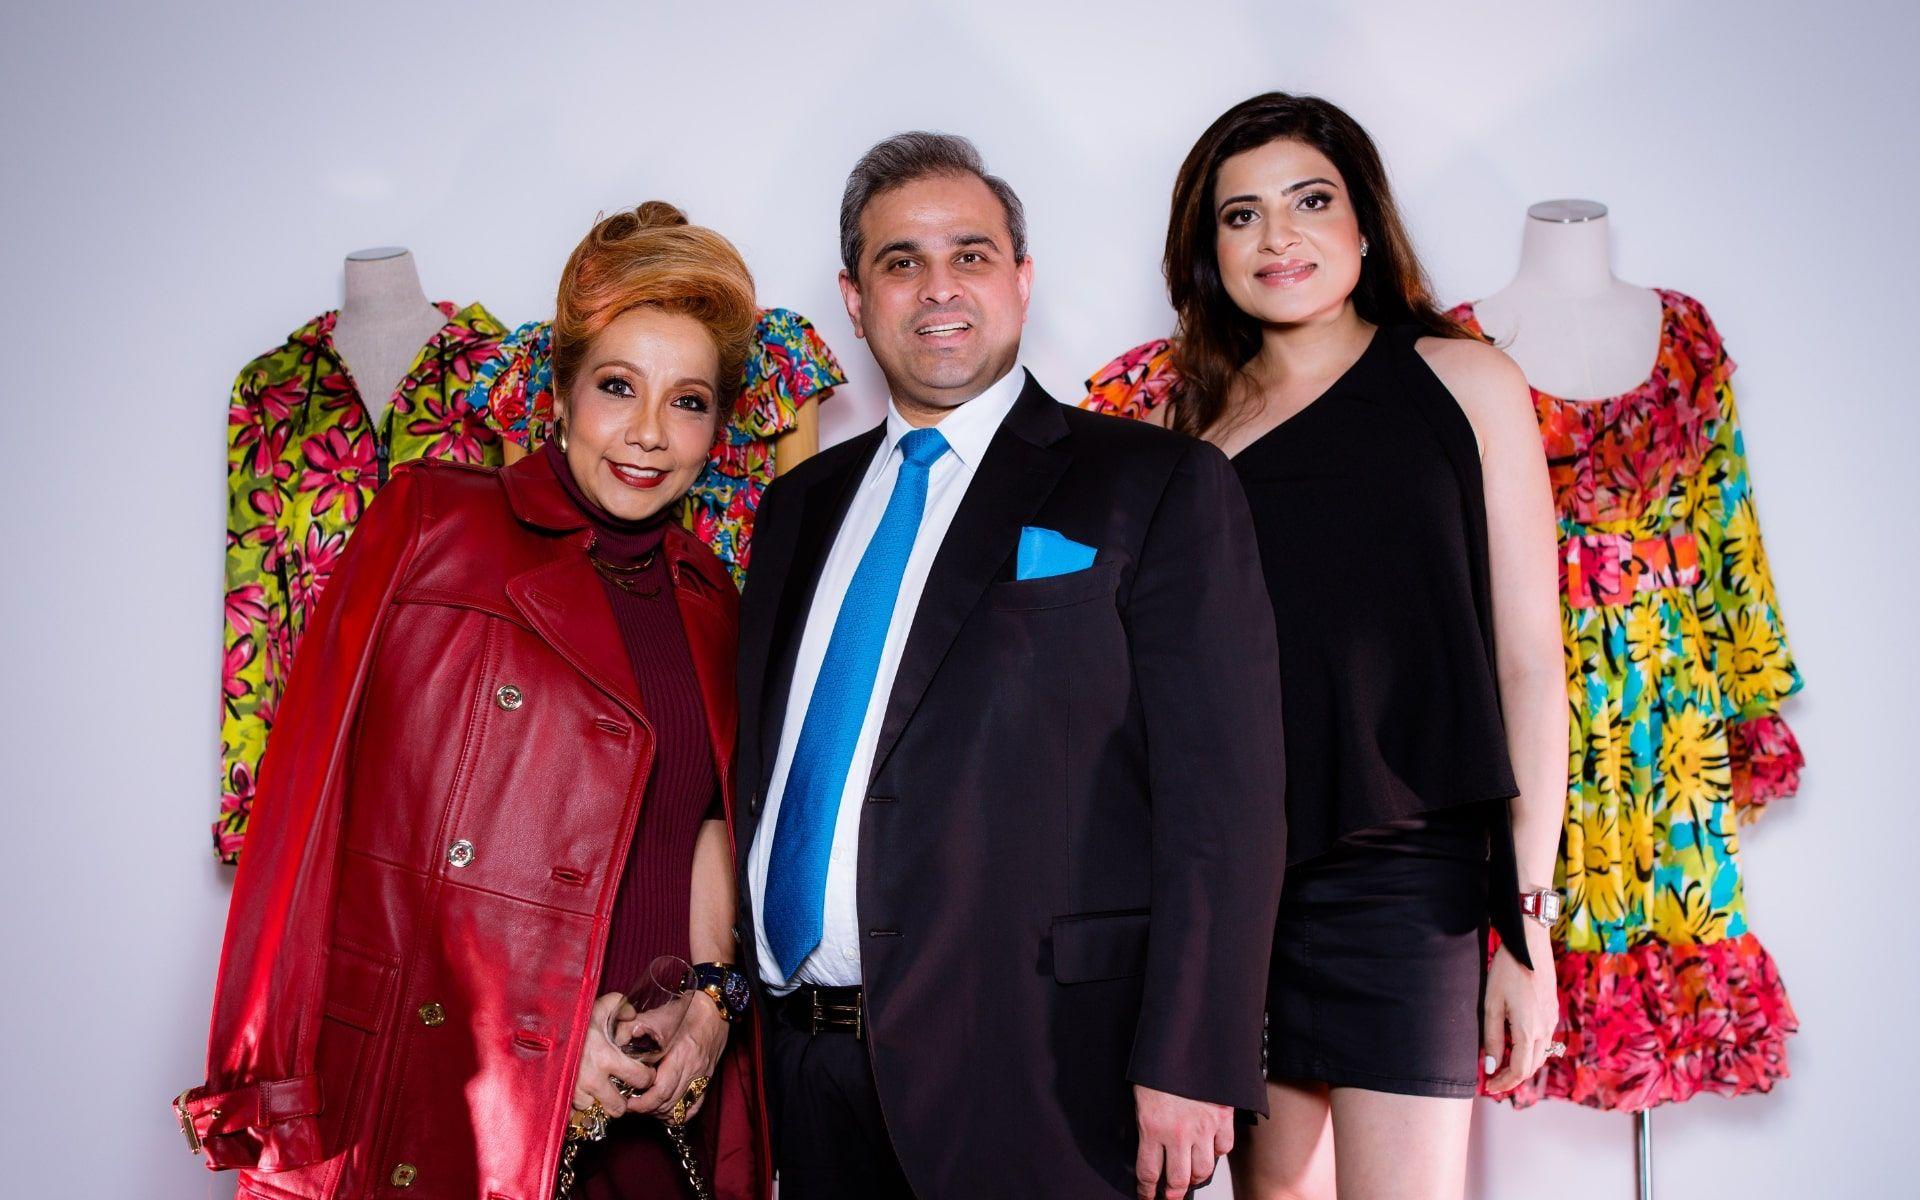 Datin Sri Chris Abishegam, Sharan Valiram and Roshan Valiram